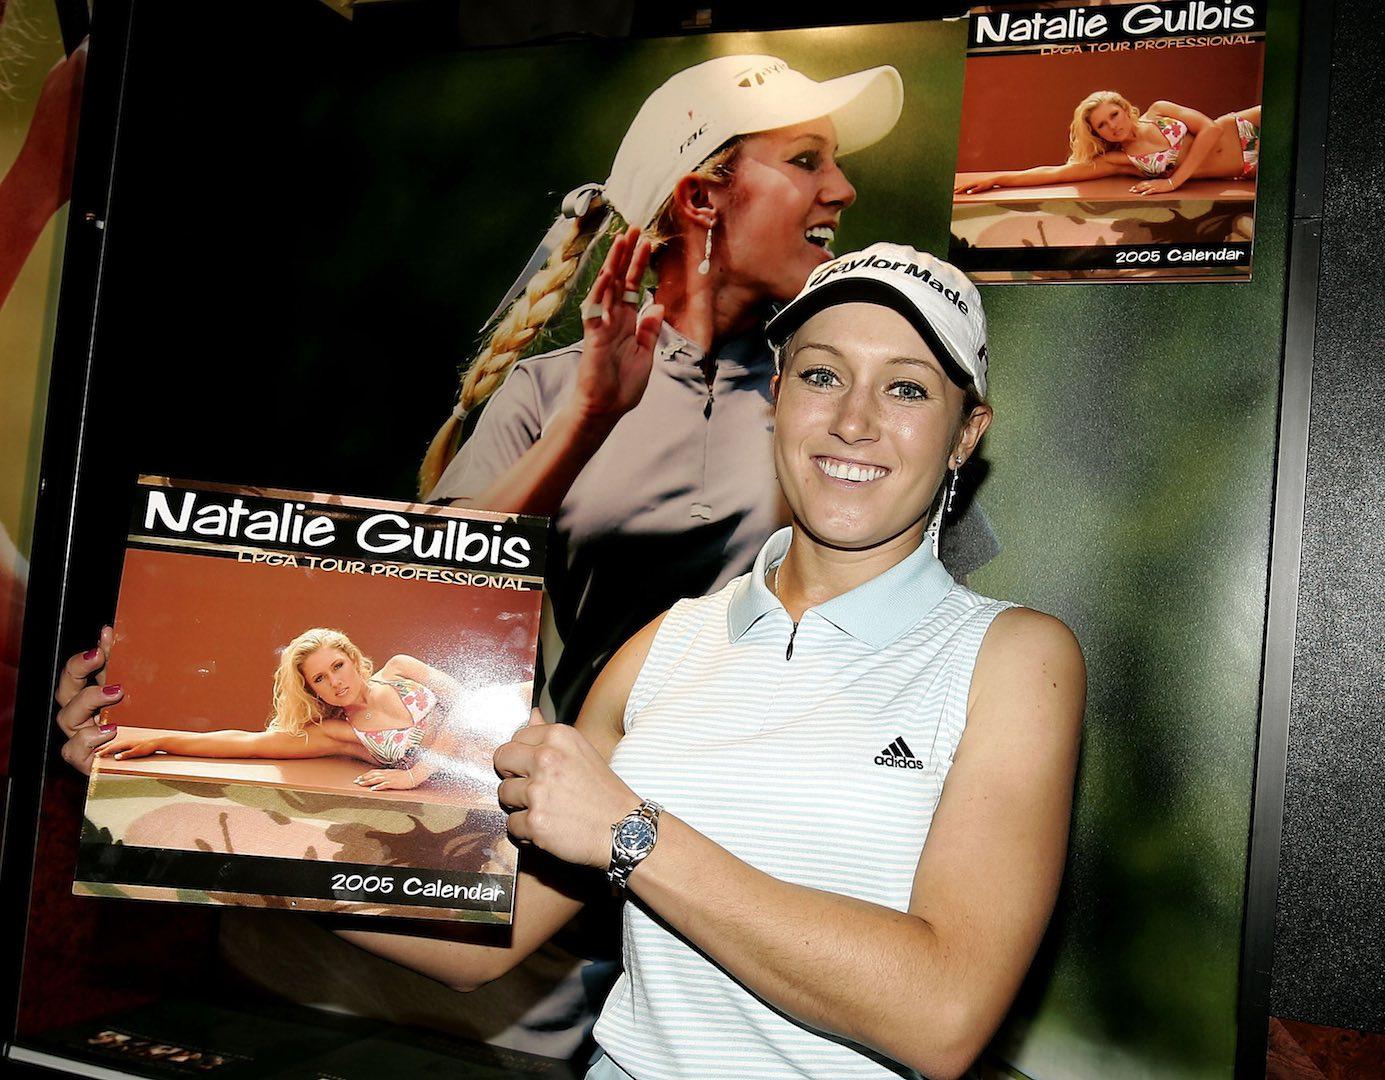 GolfPunk Classics: Natalie Gulbis Swingin' Siren